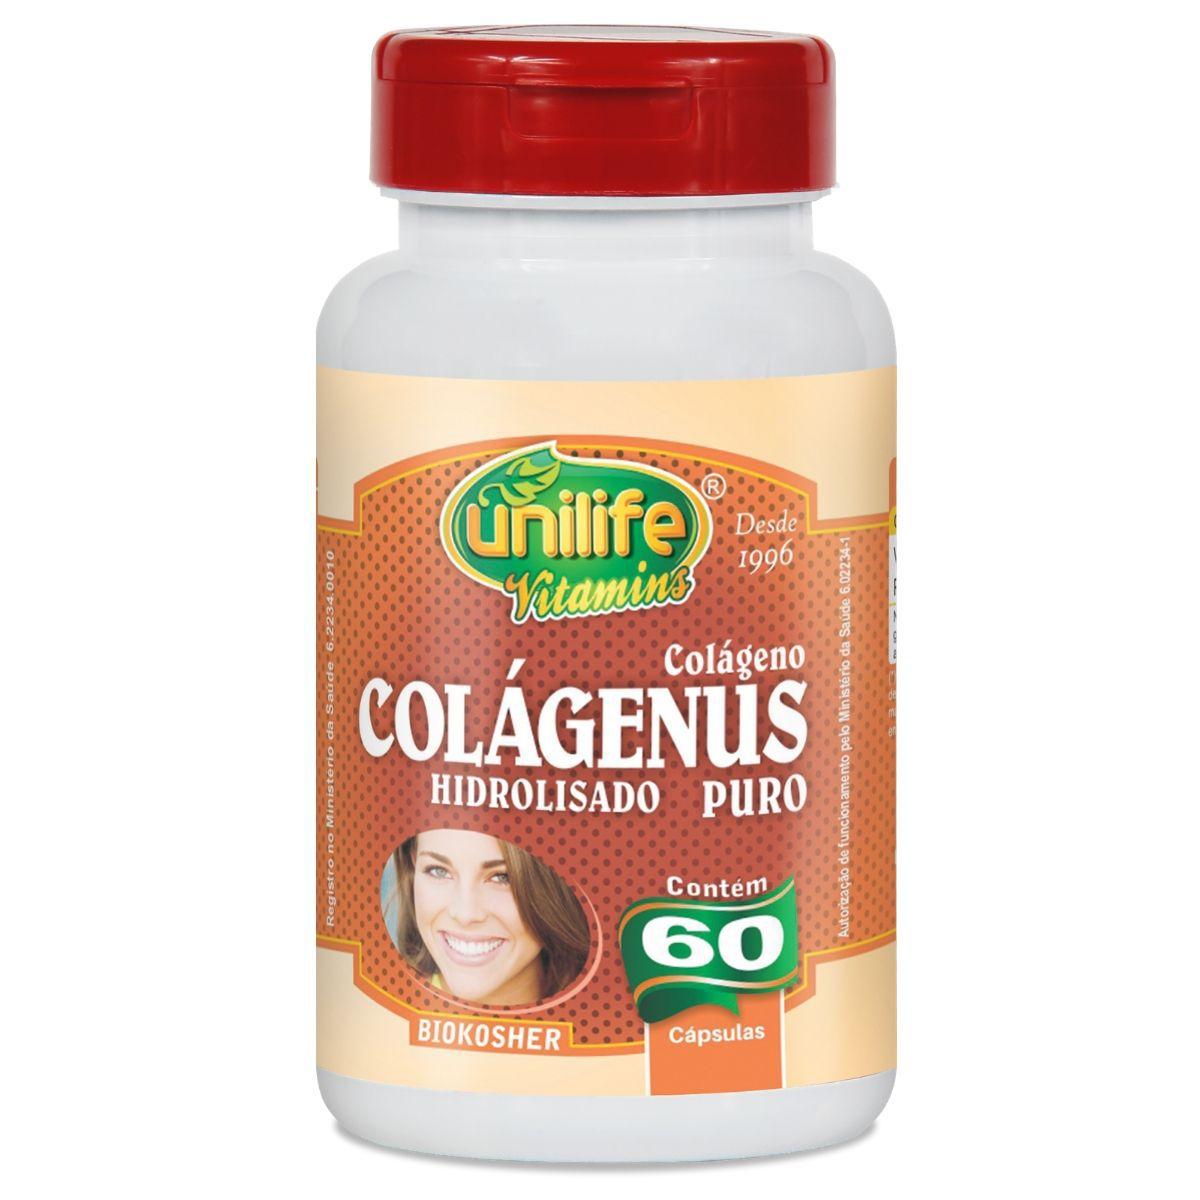 Colágeno Hidrolisado Puro 450mg 60 capsulas - Unilife